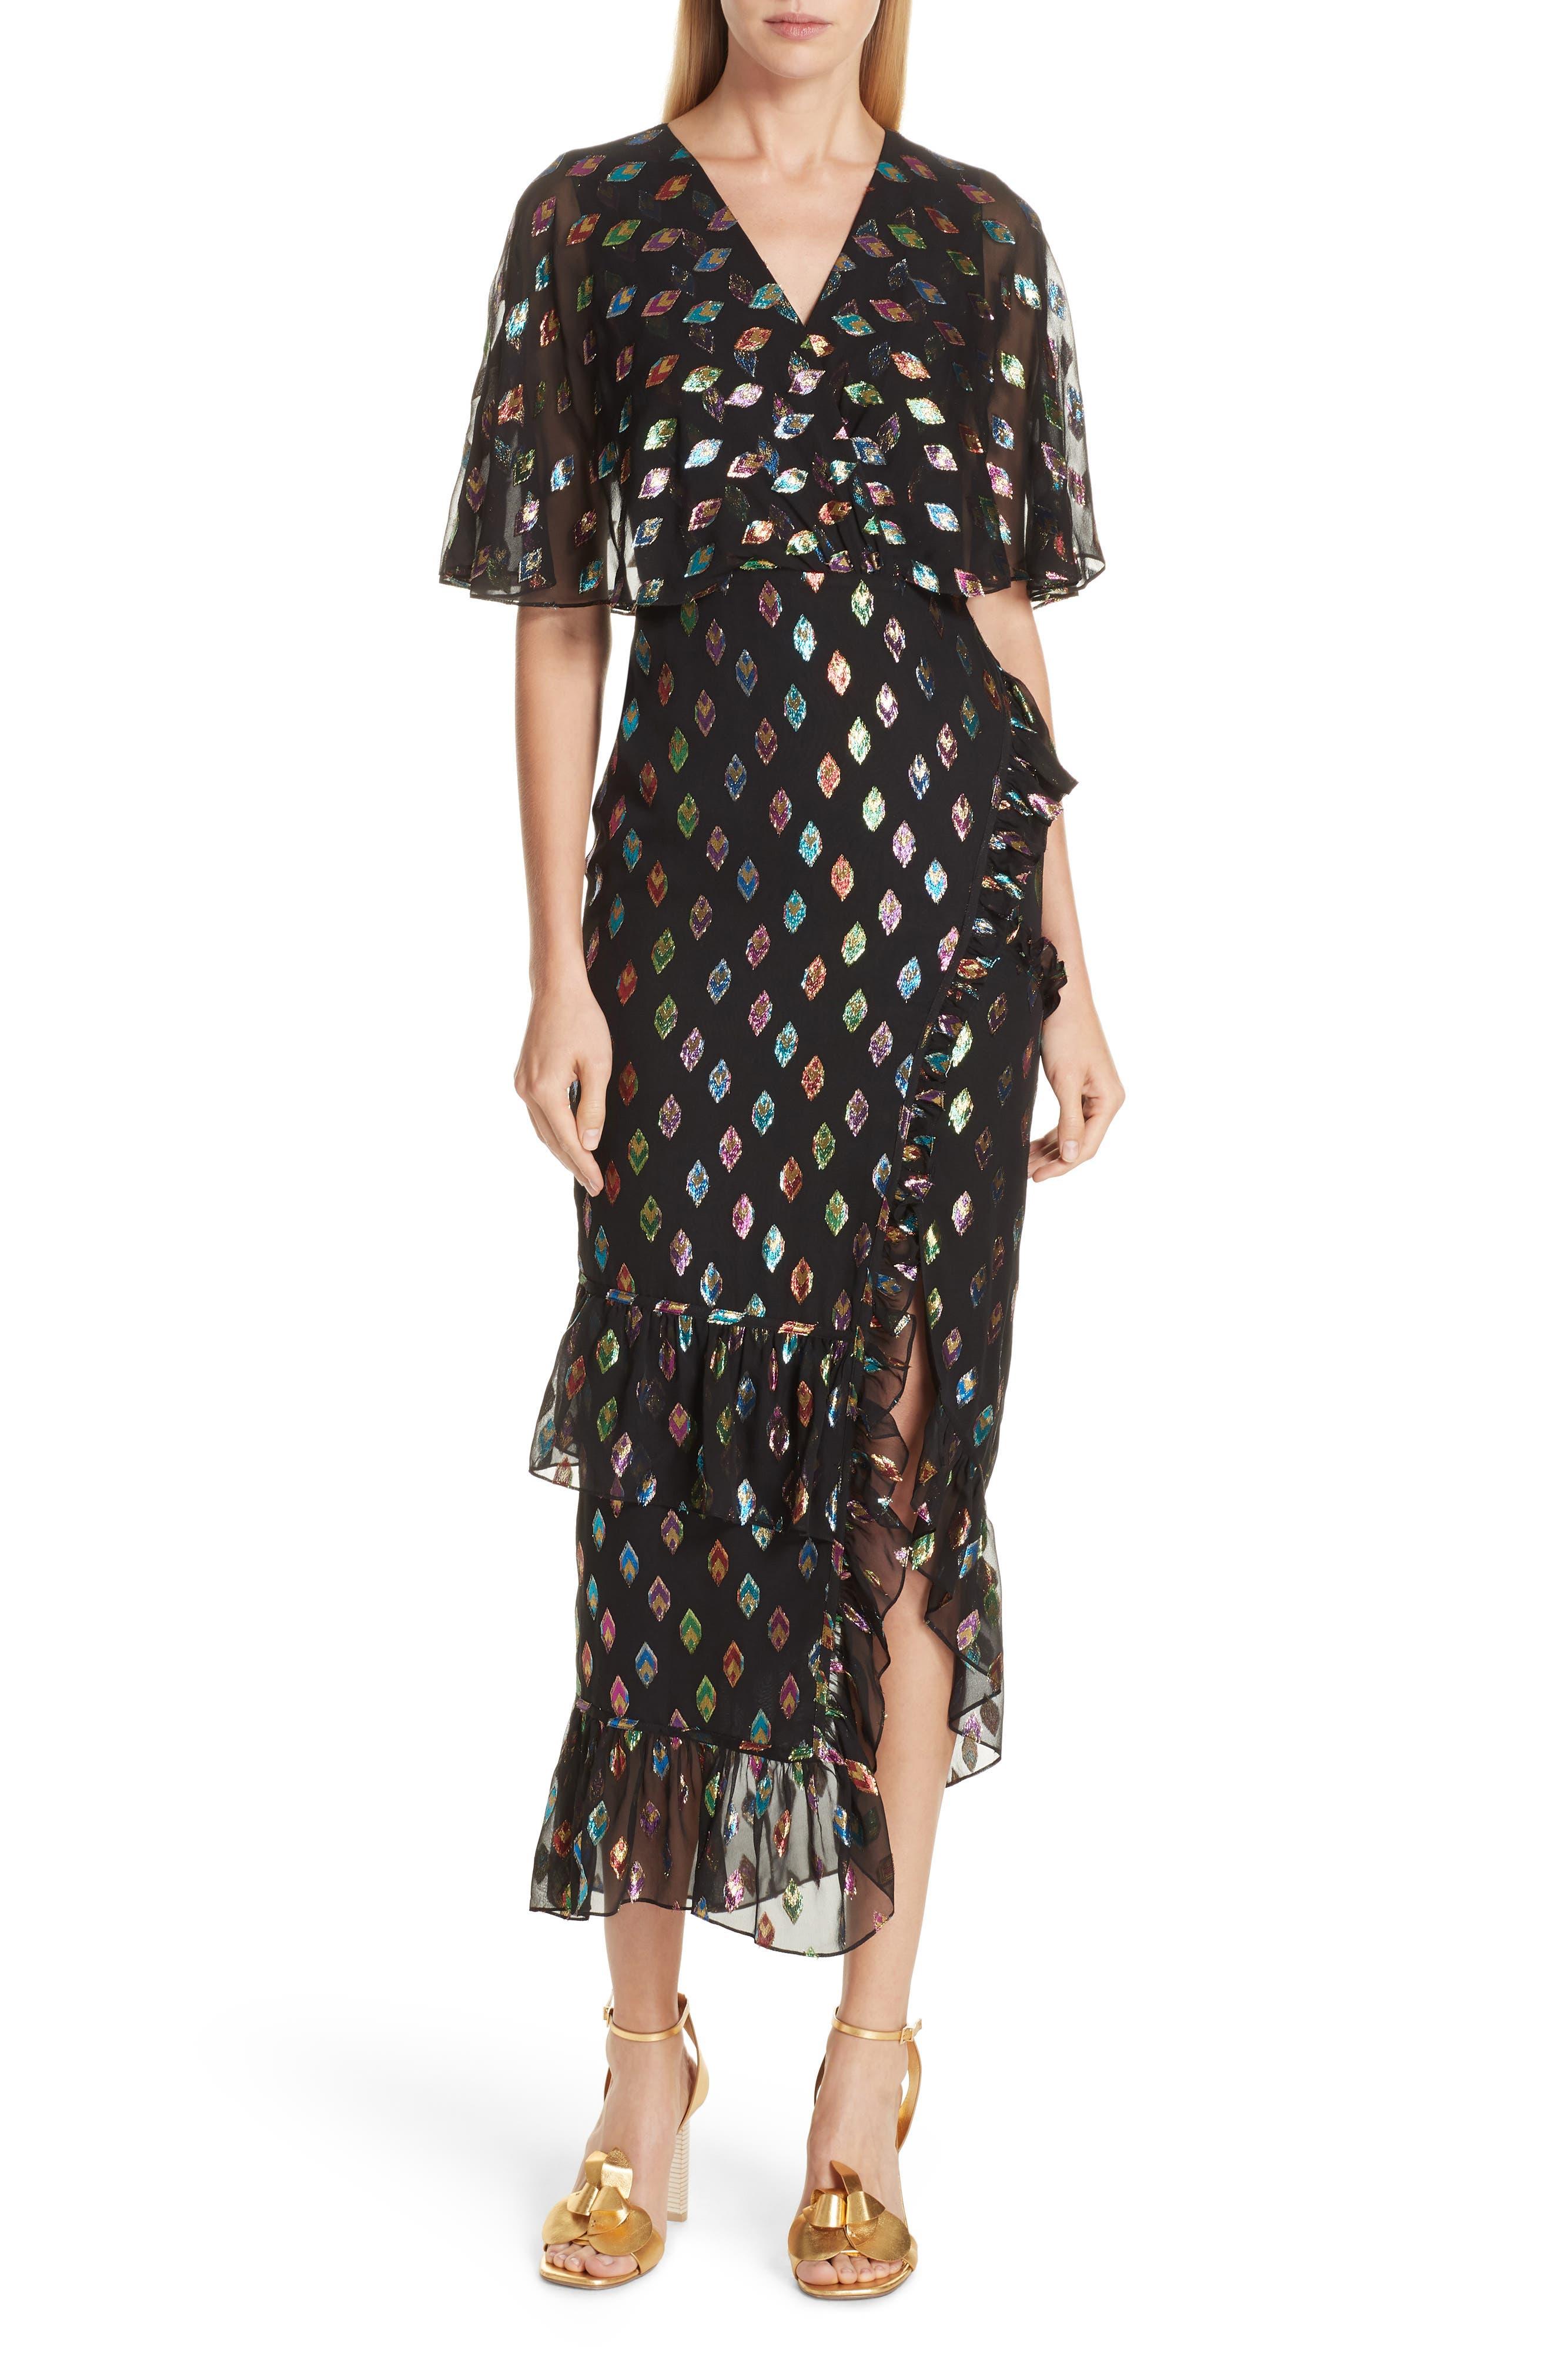 SALONI, Ruffle Hem Silk Blend Dress, Main thumbnail 1, color, 003